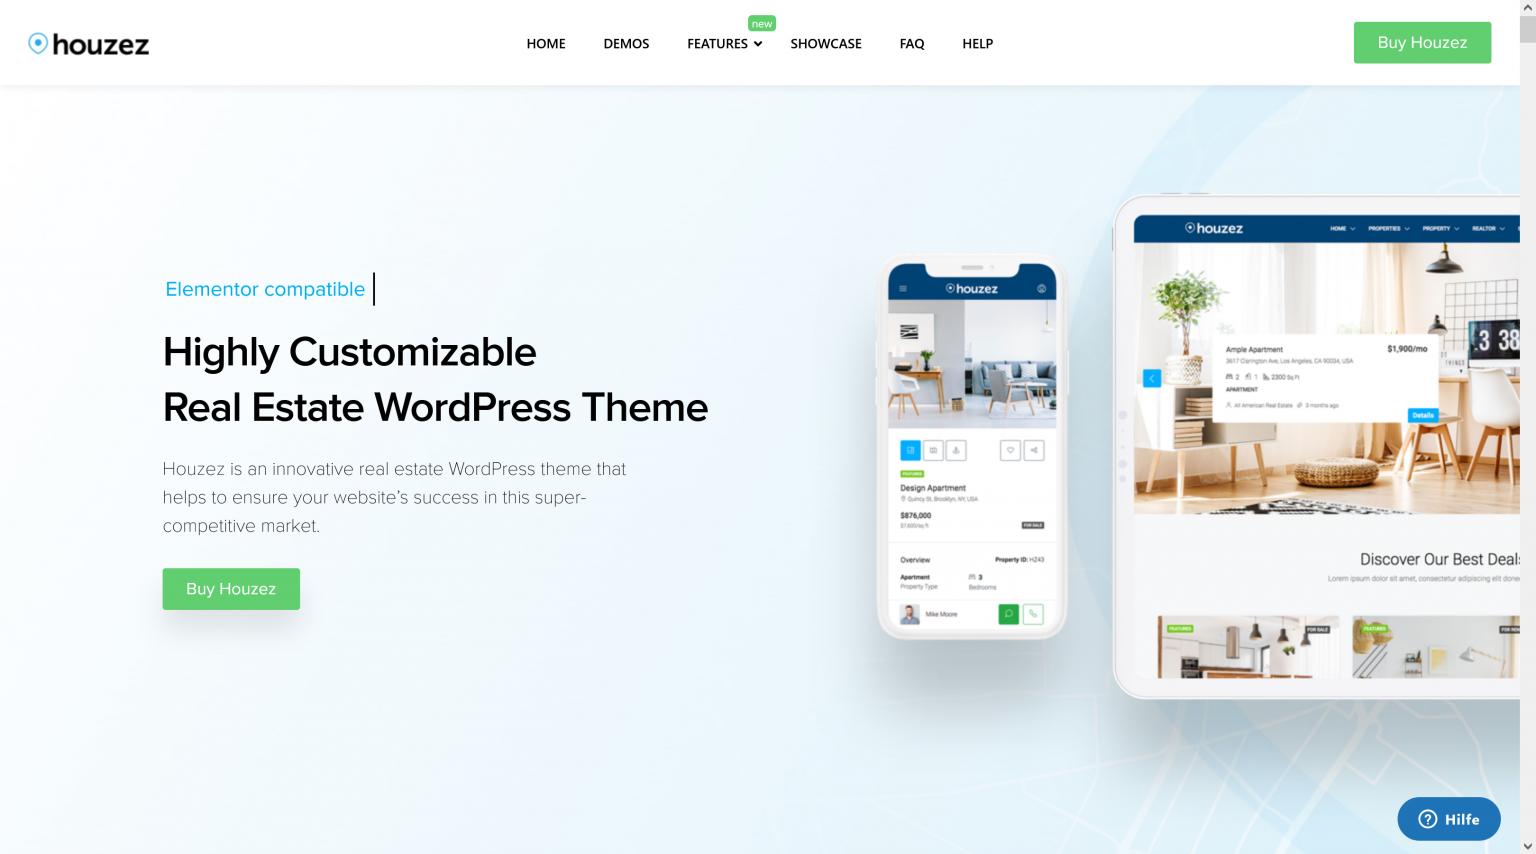 Houzez 2.4.0 – Real Estate WordPress Theme